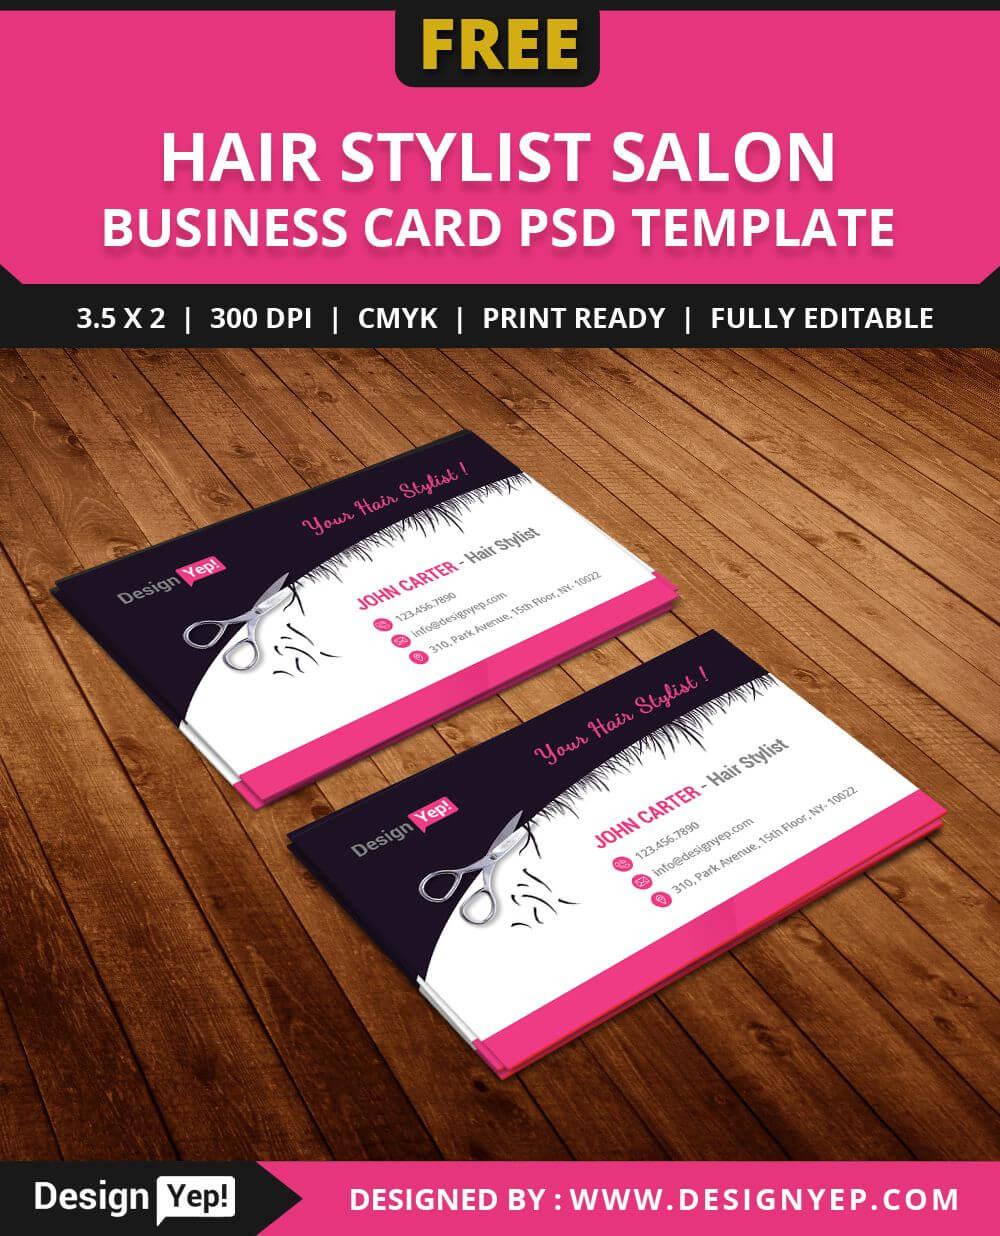 Free-Hair-Stylist-Salon-Business-Card-Template-Psd   Free throughout Hair Salon Business Card Template